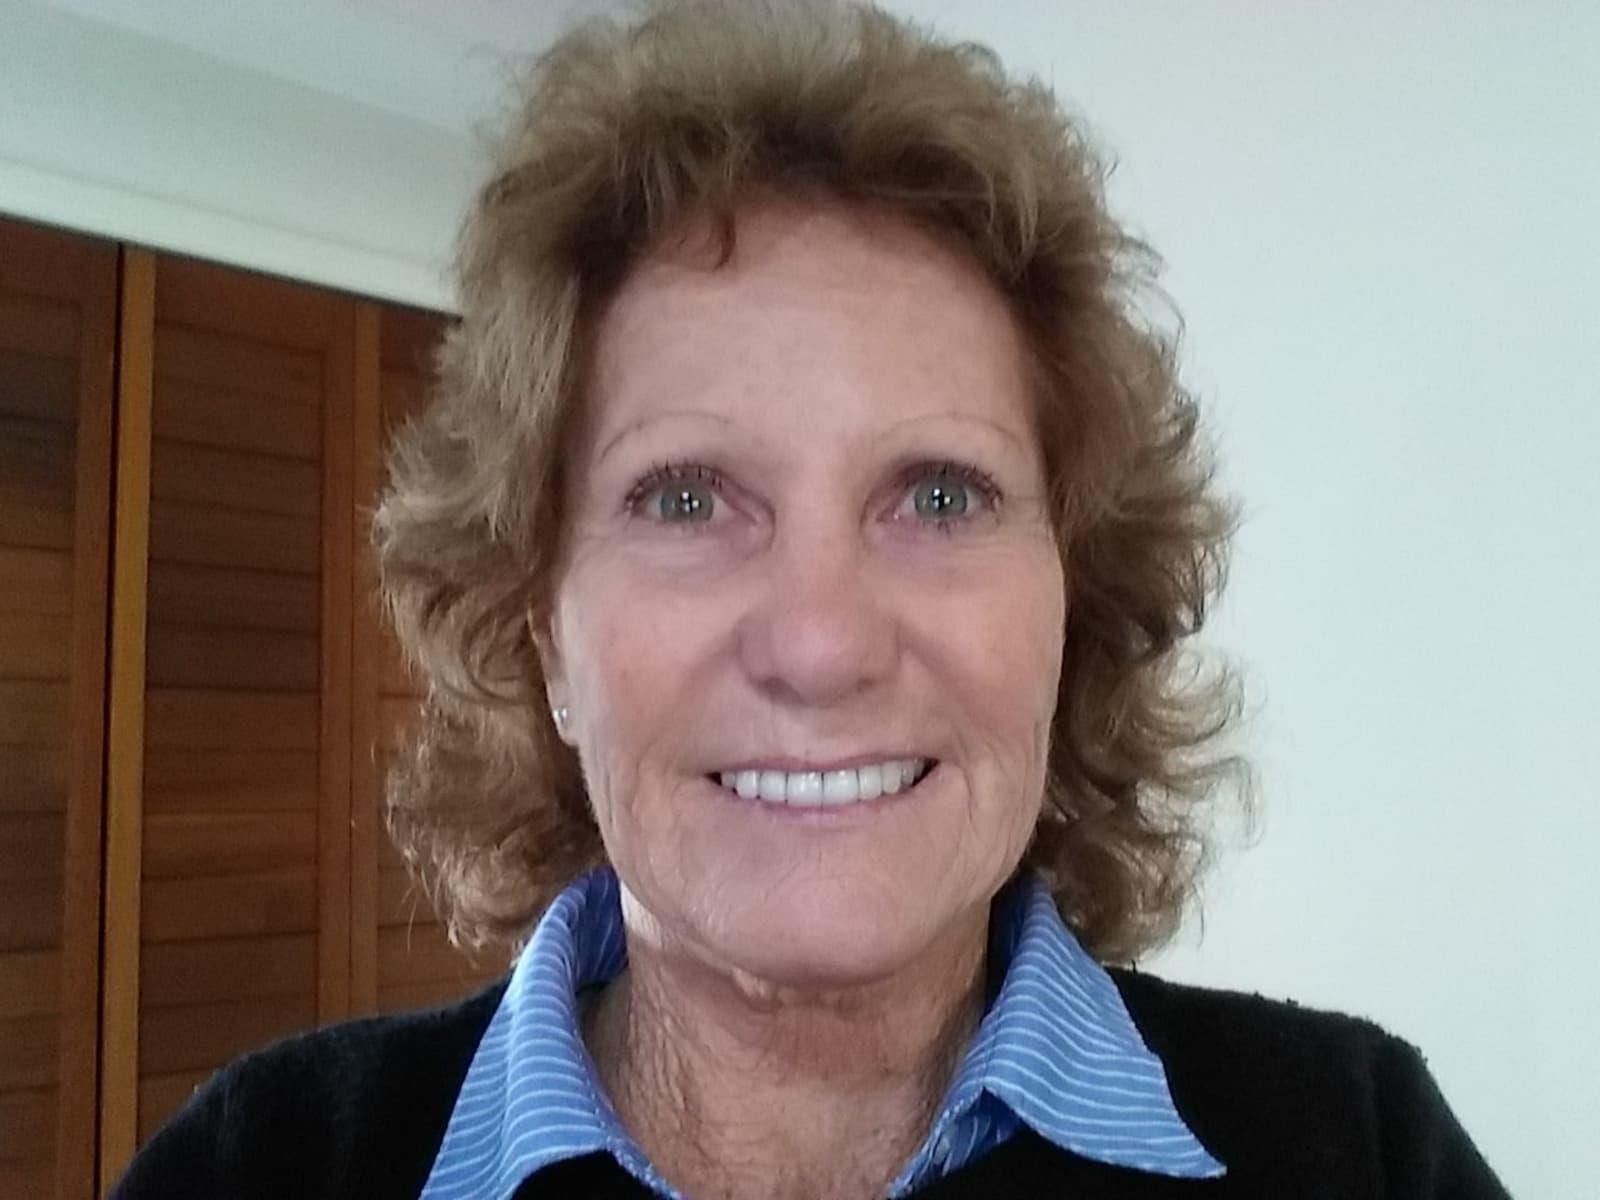 Nicolette from Gold Coast, Queensland, Australia